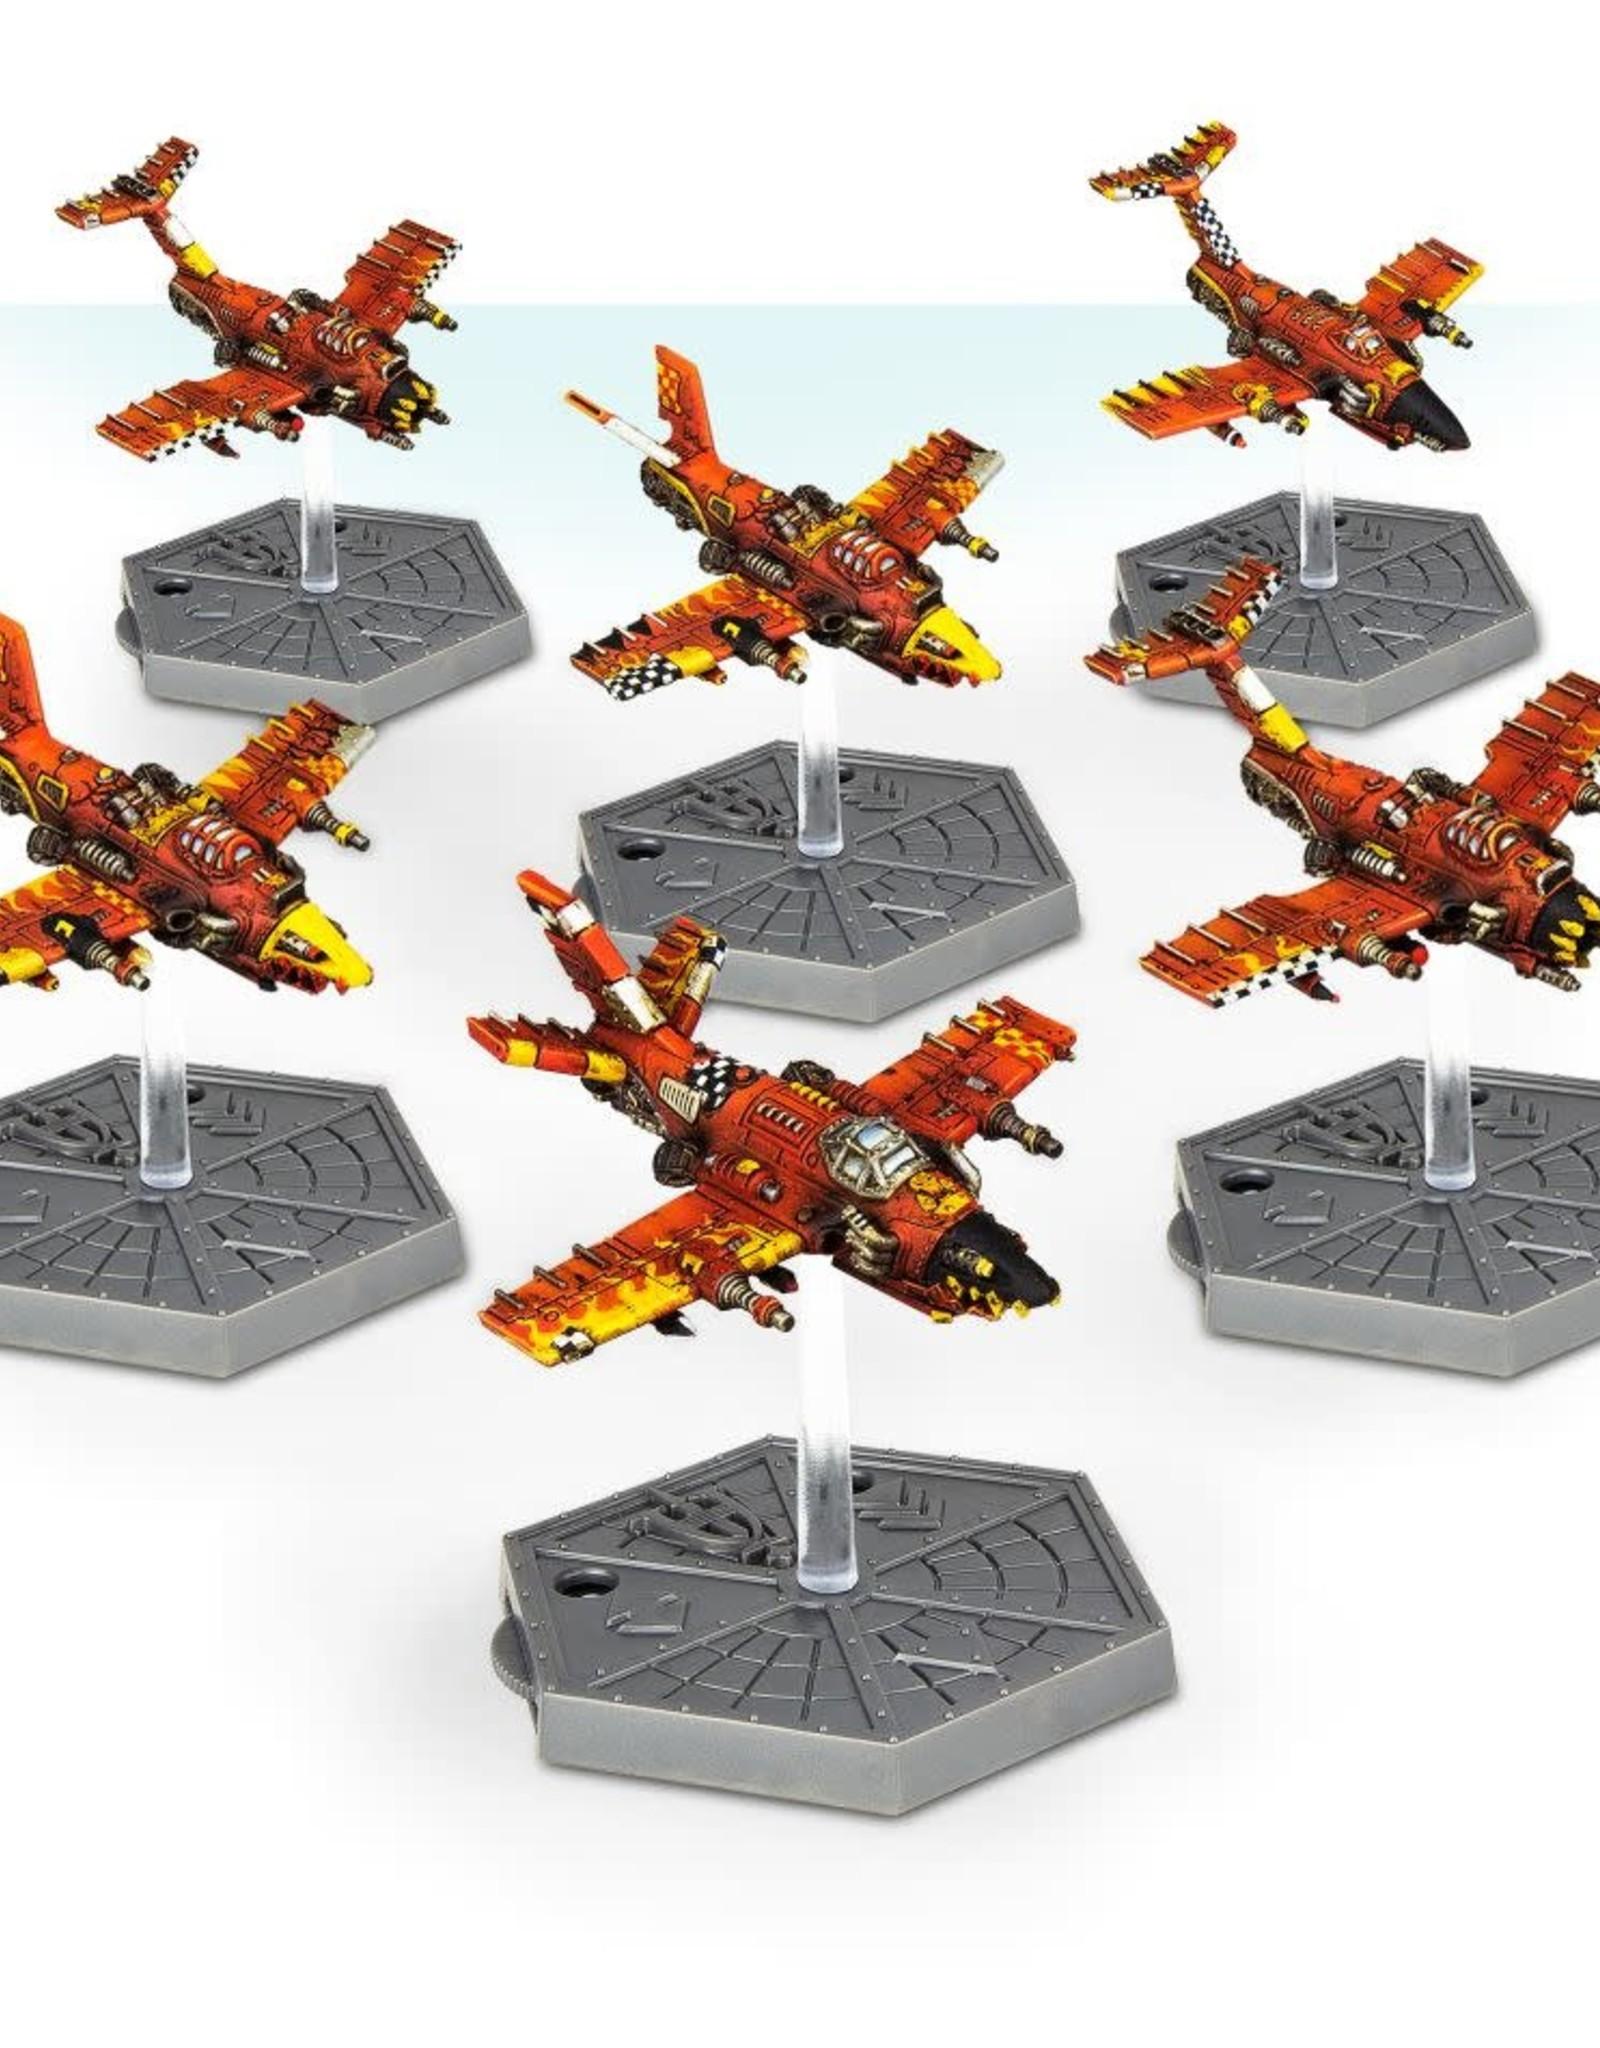 Games Workshop A/I: ORK AIR WAAAGH! DAKKAJETS